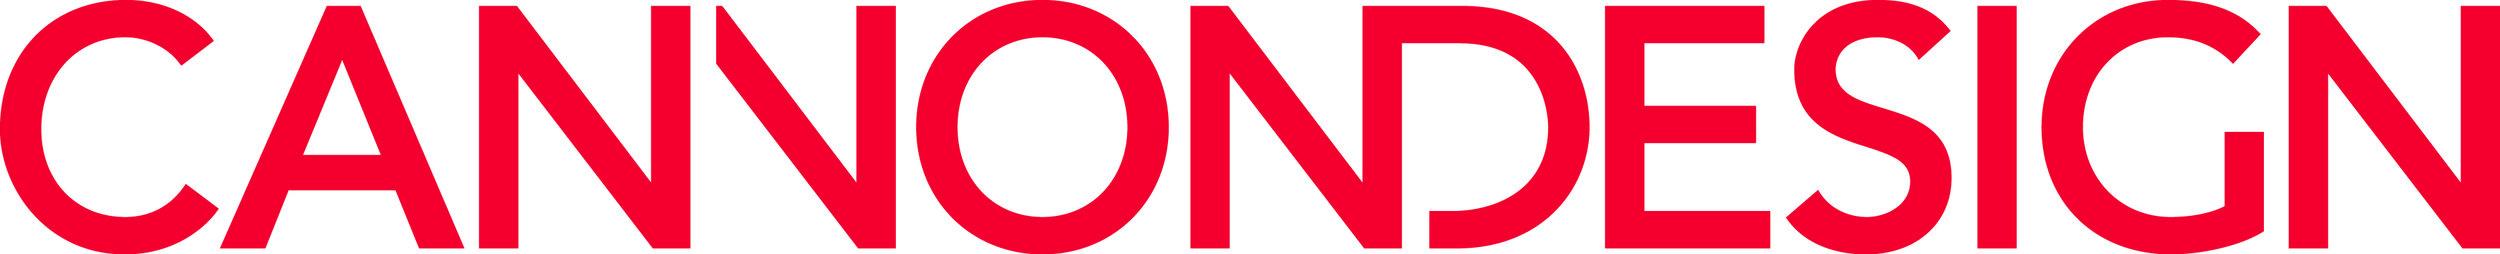 Cannon_logo.jpg